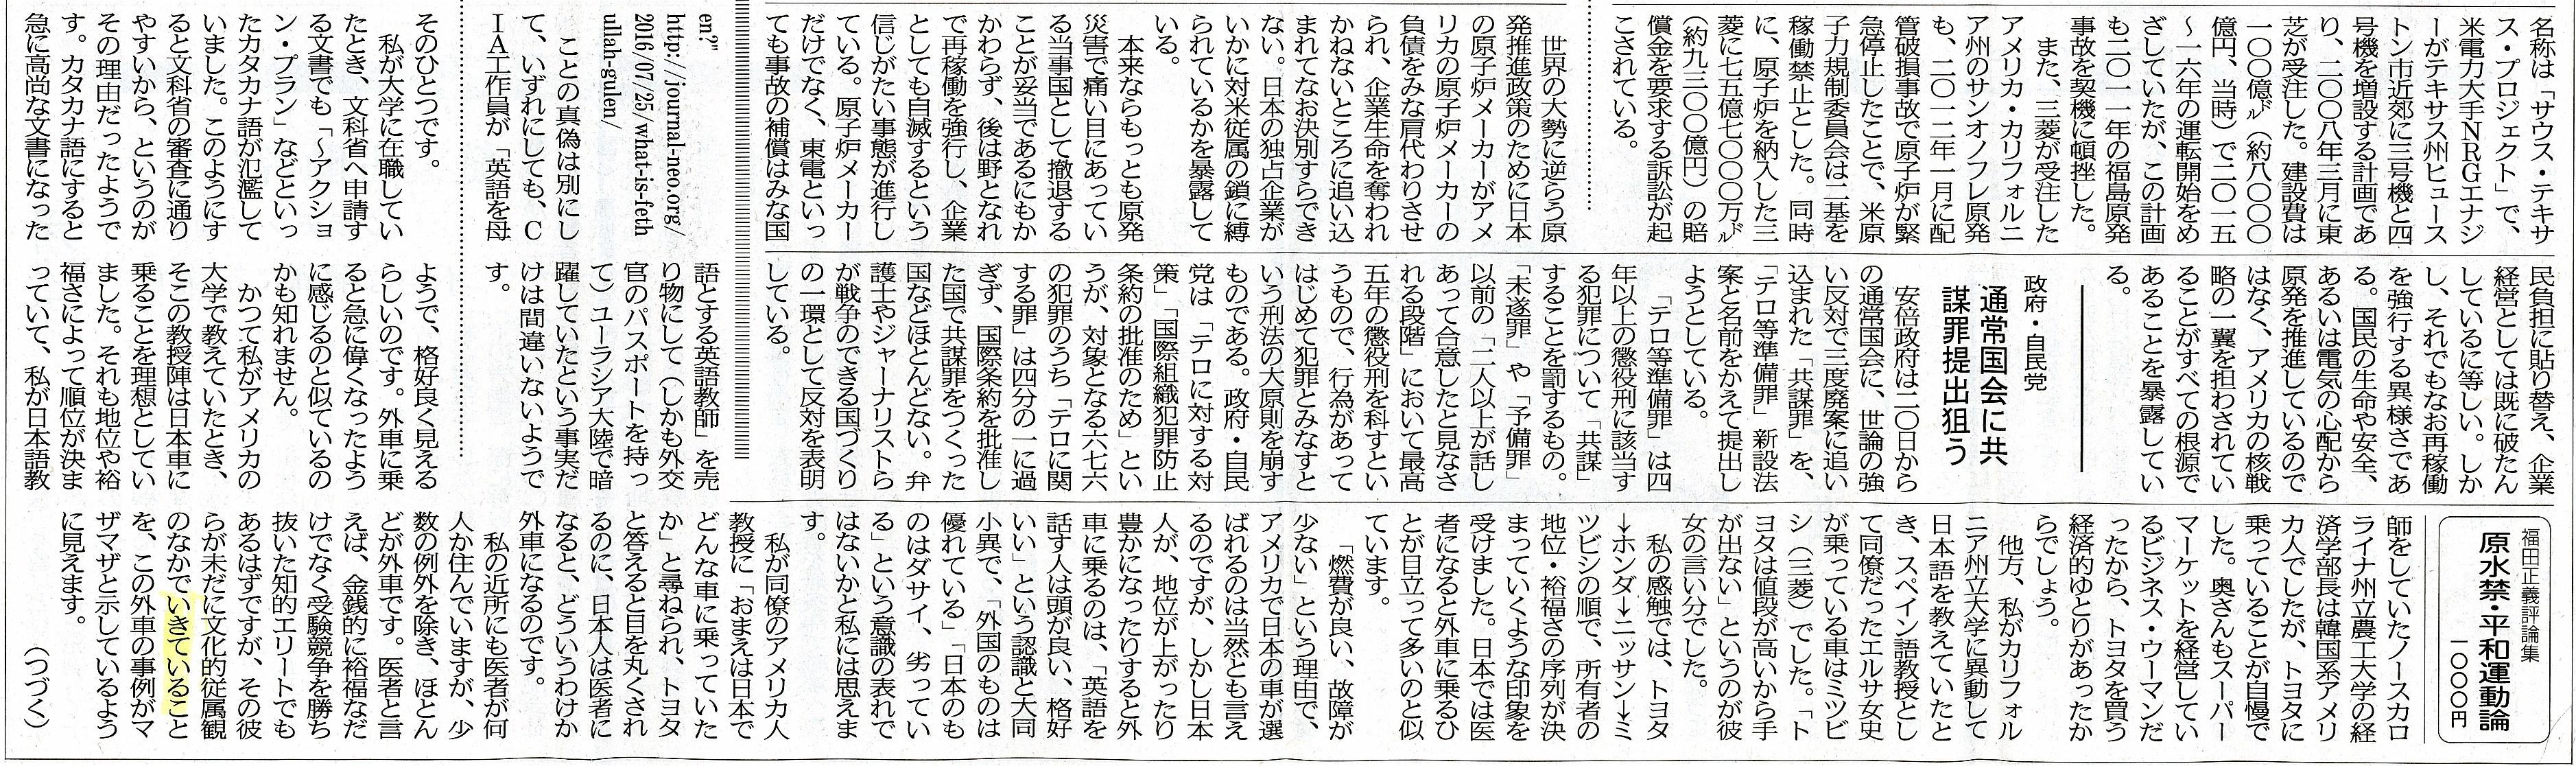 s-長周新聞20170111 軍事的従属と文化的従属3-2